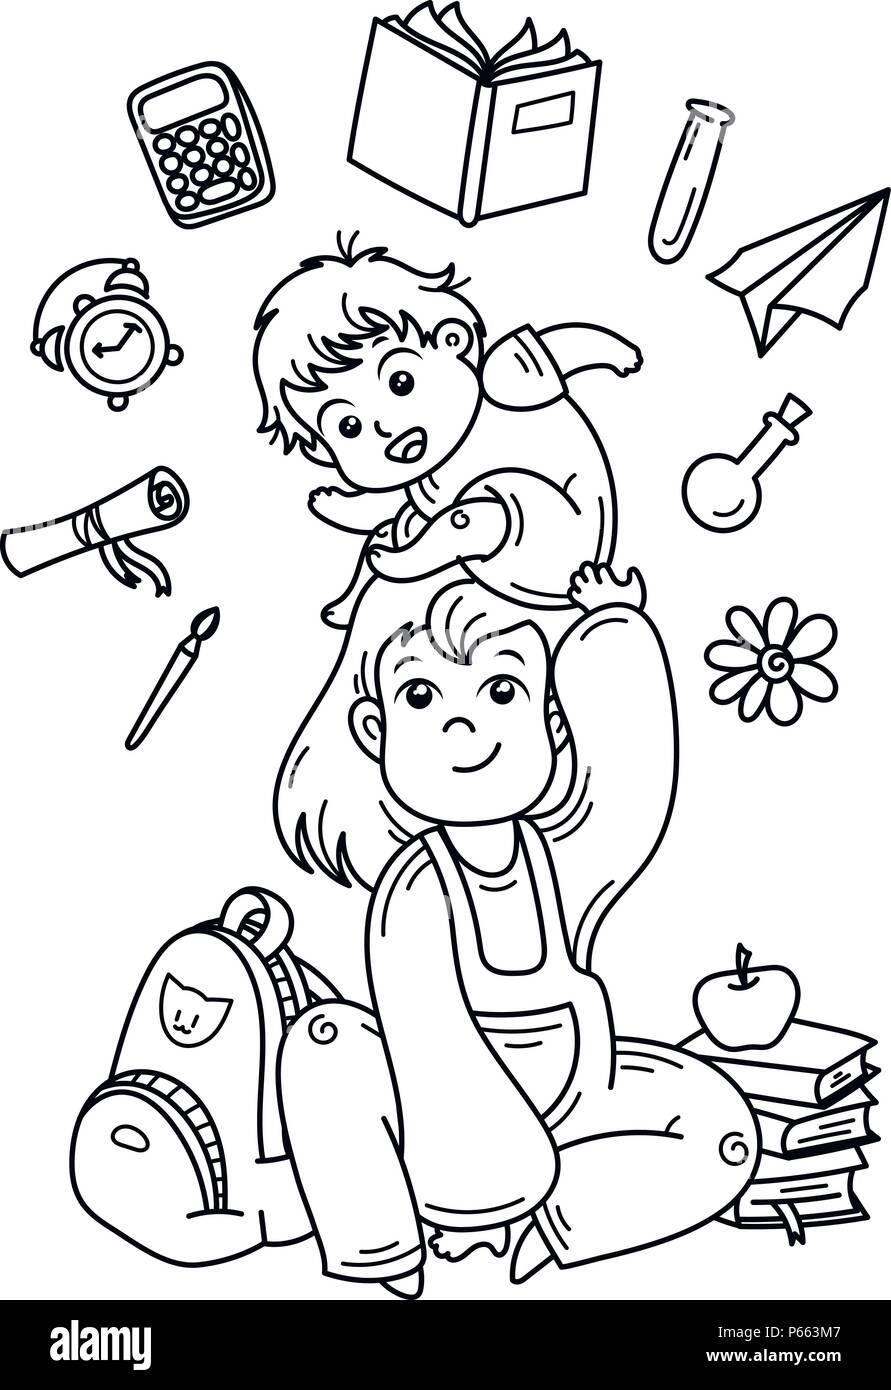 Moderno Libro Para Colorear De Bebé Galería - Ideas Creativas para ...